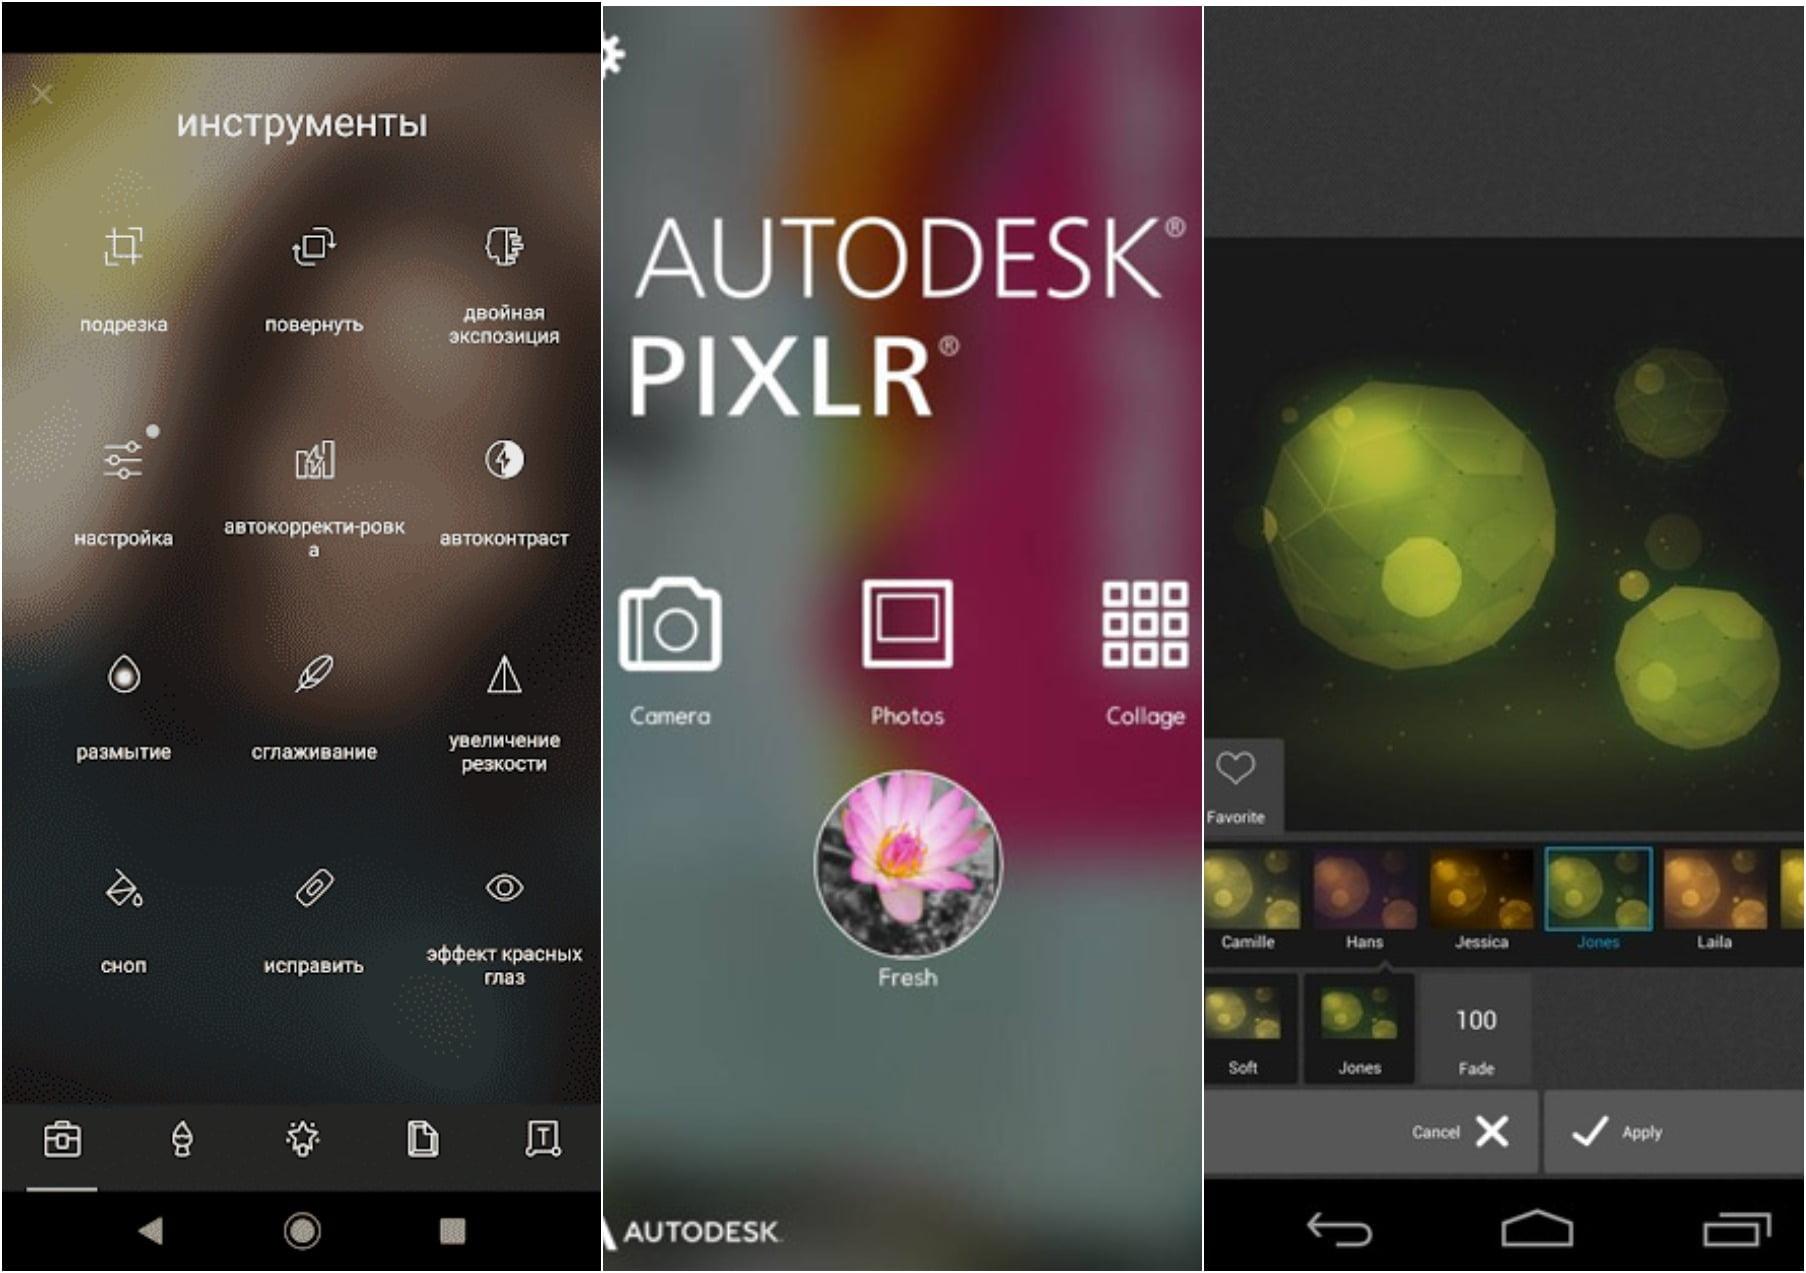 На фото приложение Autodesk Pixlr